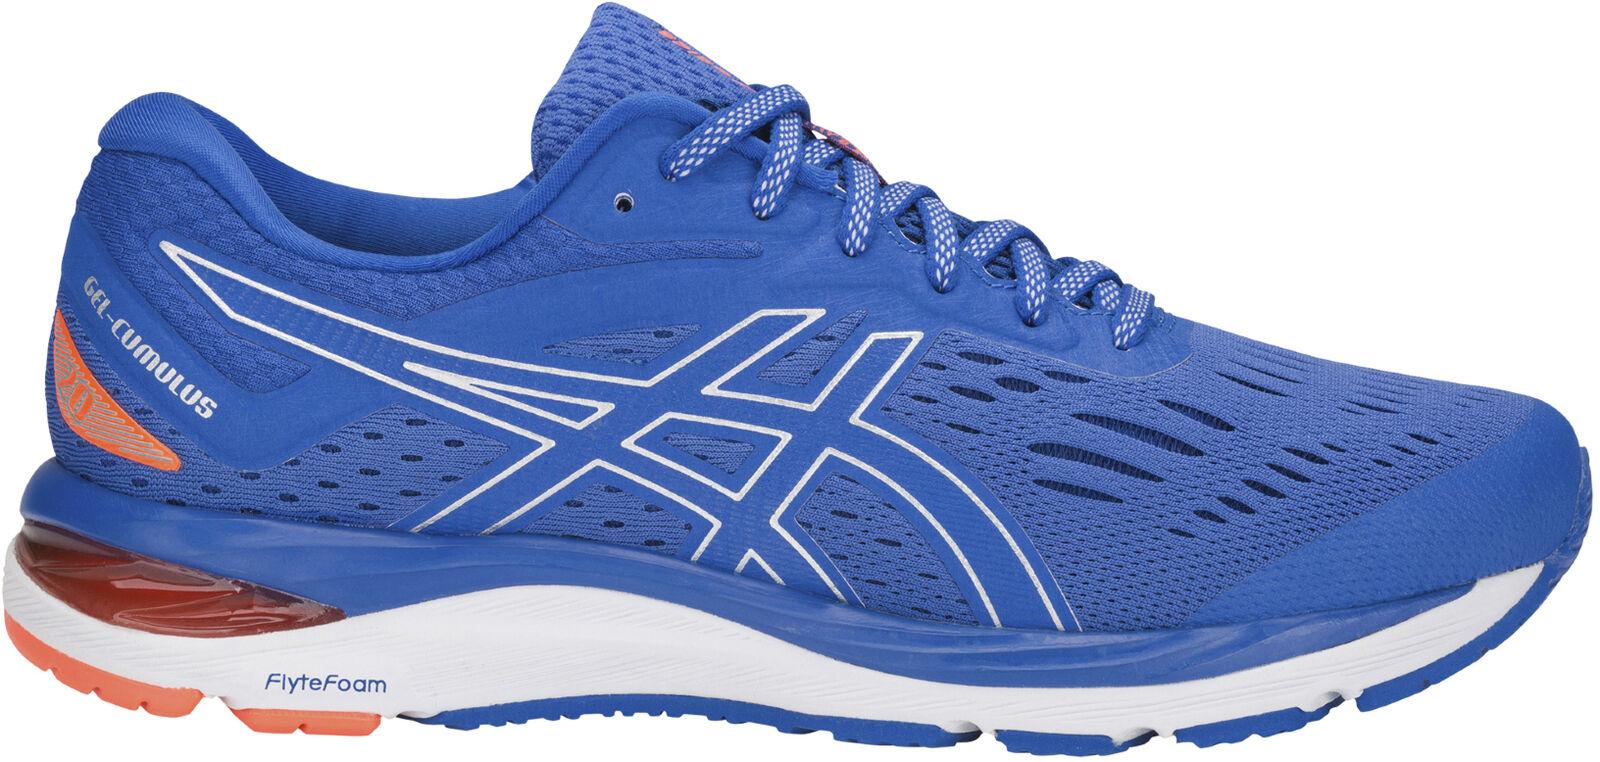 Asics Gel Cumulus 20 Mens Running shoes - bluee